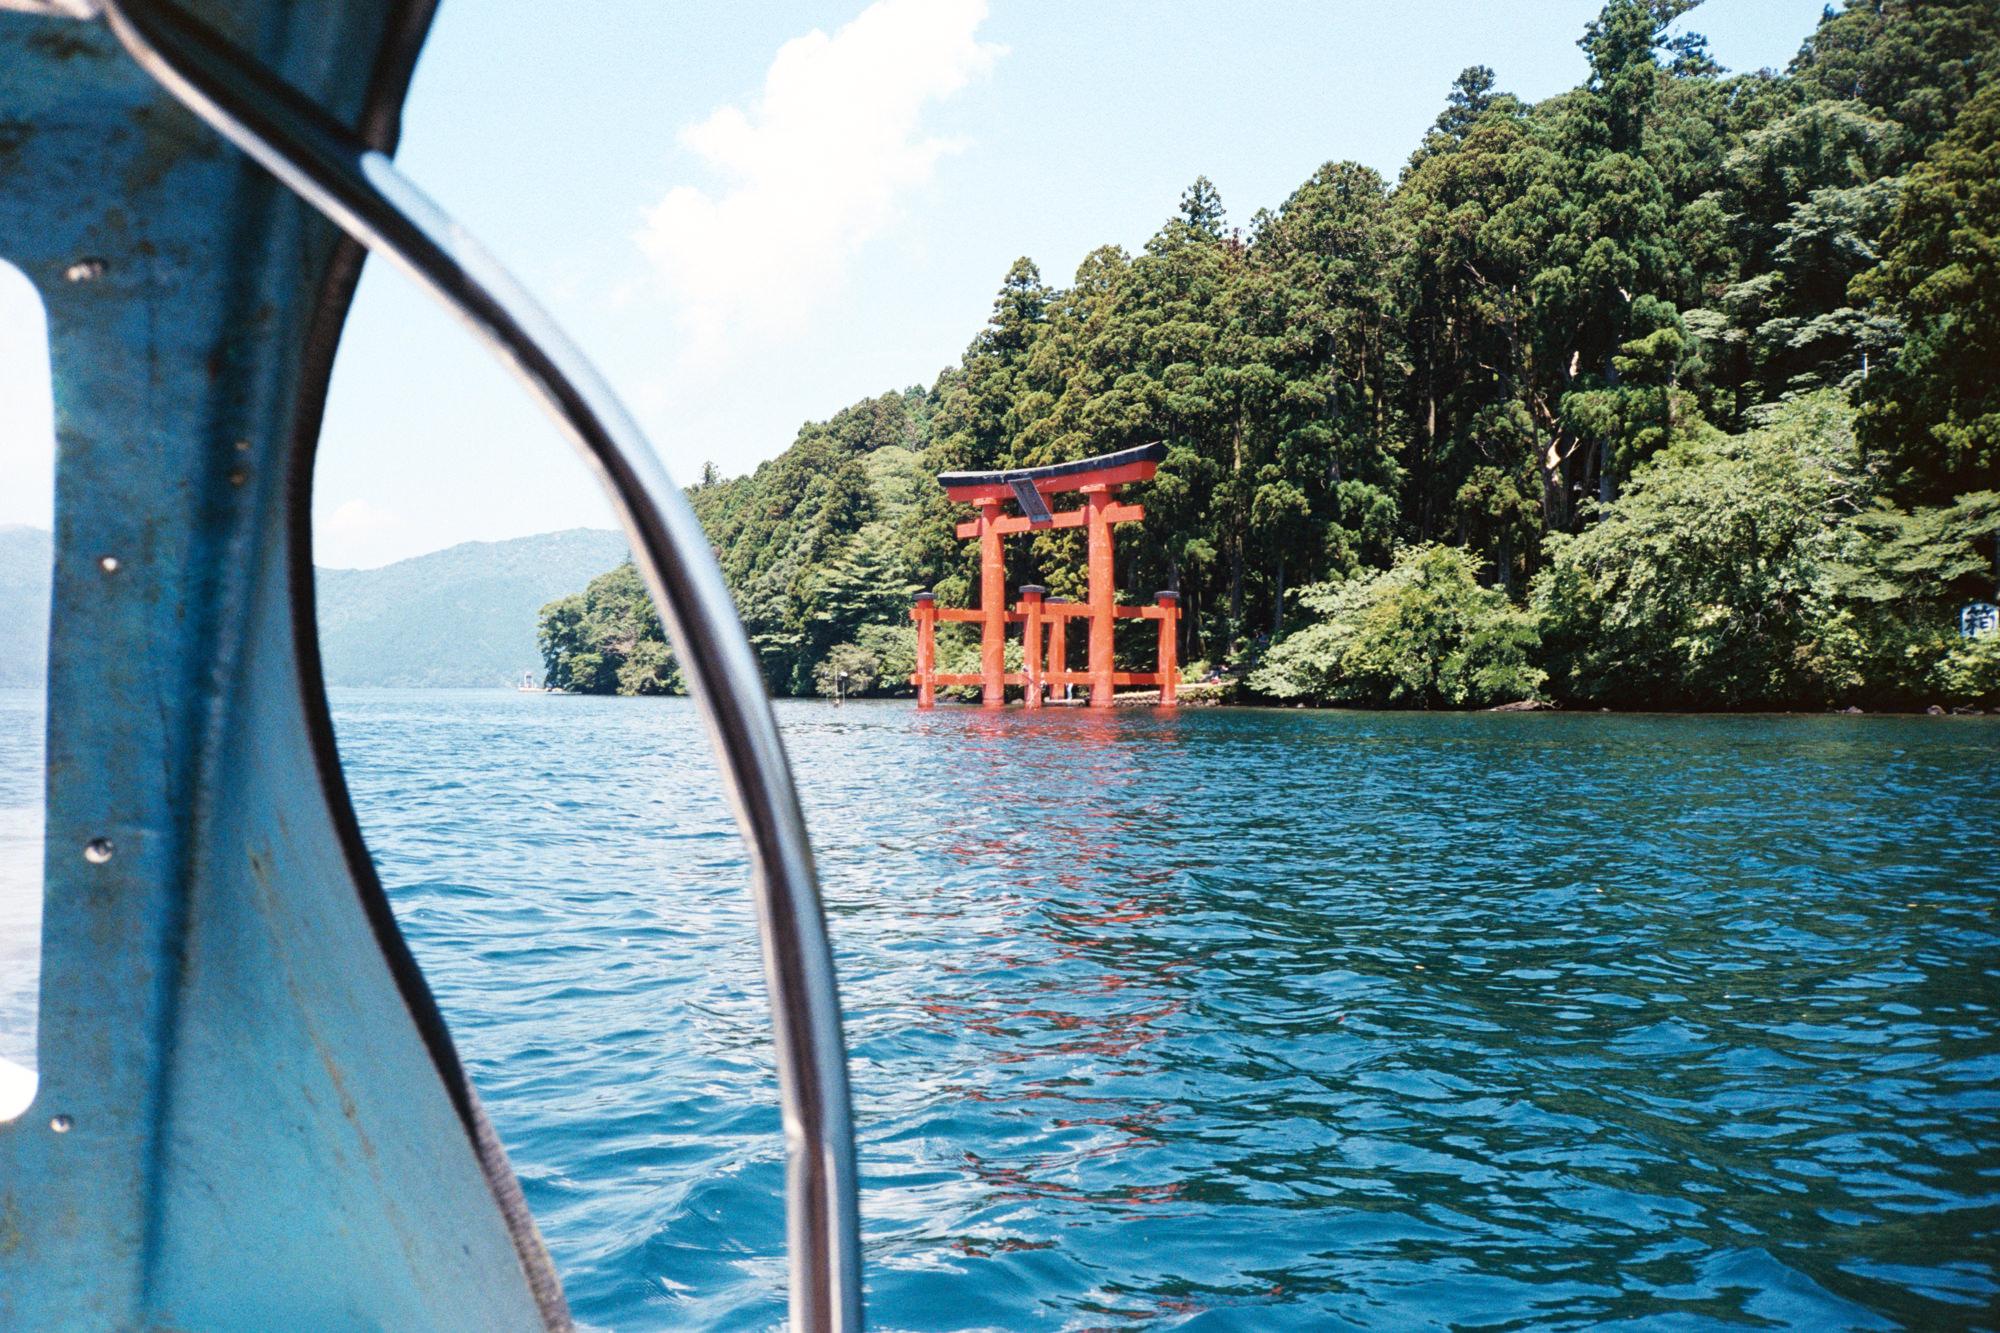 wrenee-hakone-japan-lake-ashi-swan-boats-14.jpg